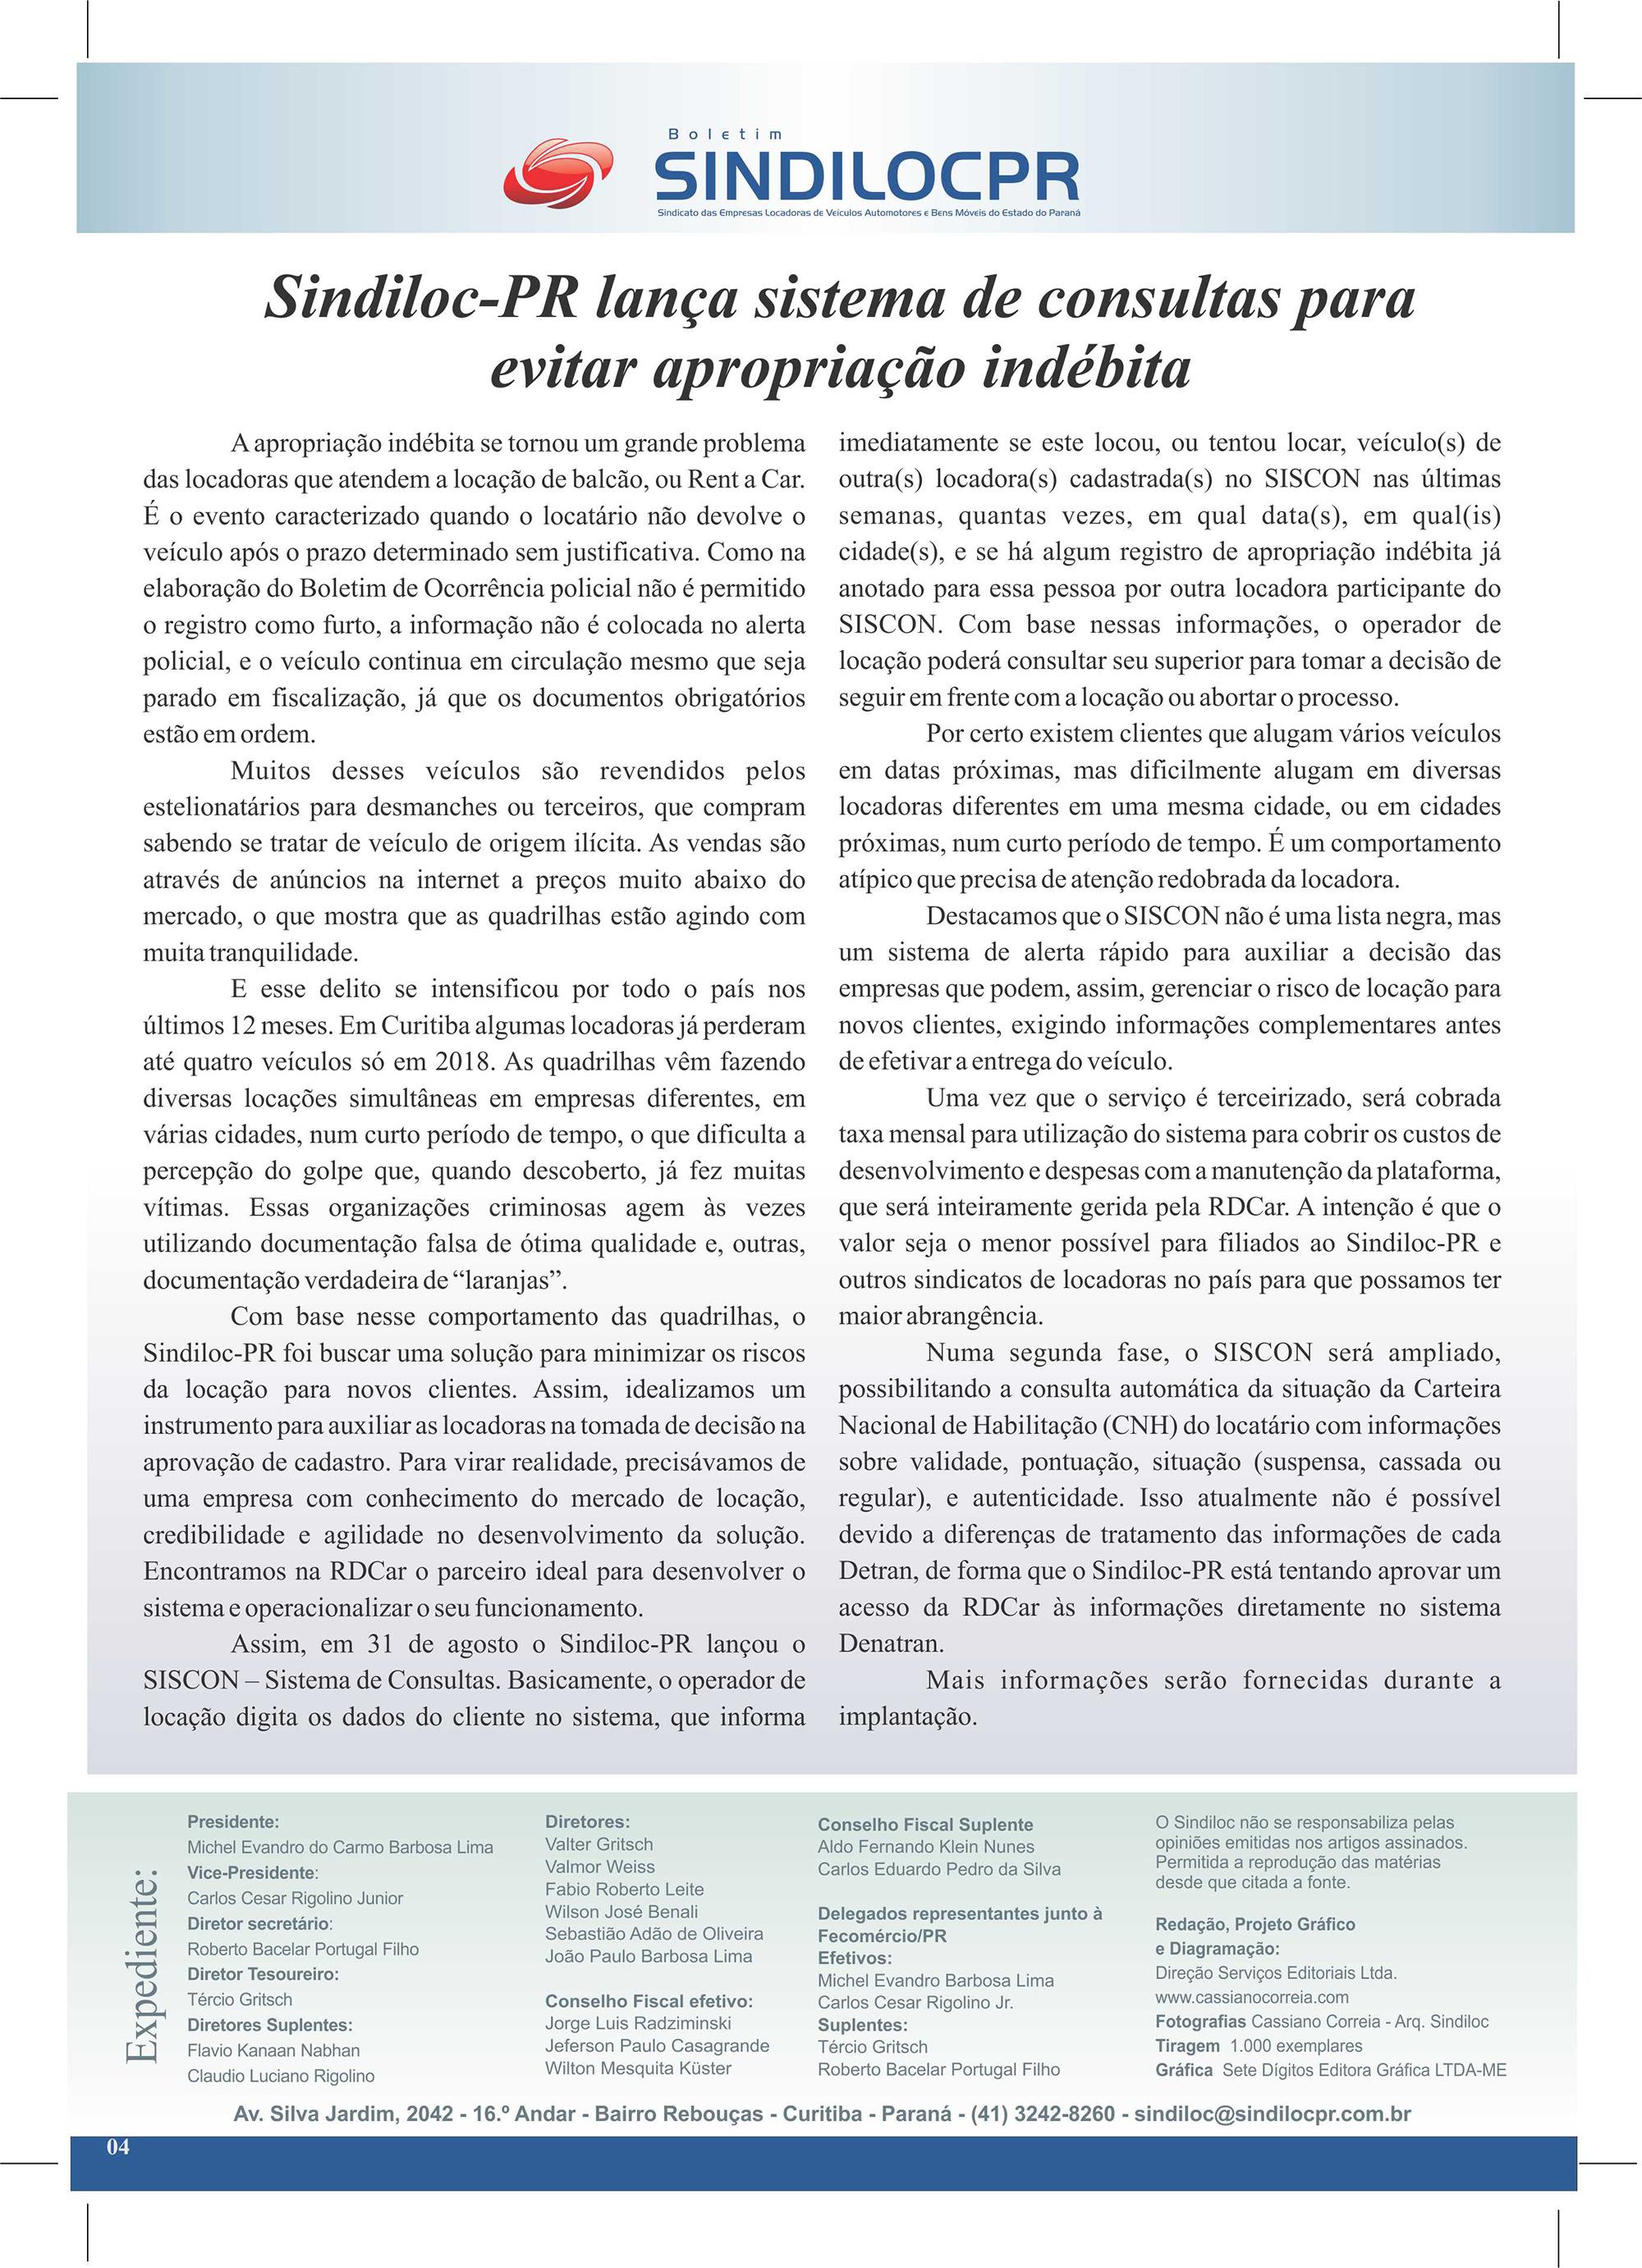 Boletim 87 - Página 4